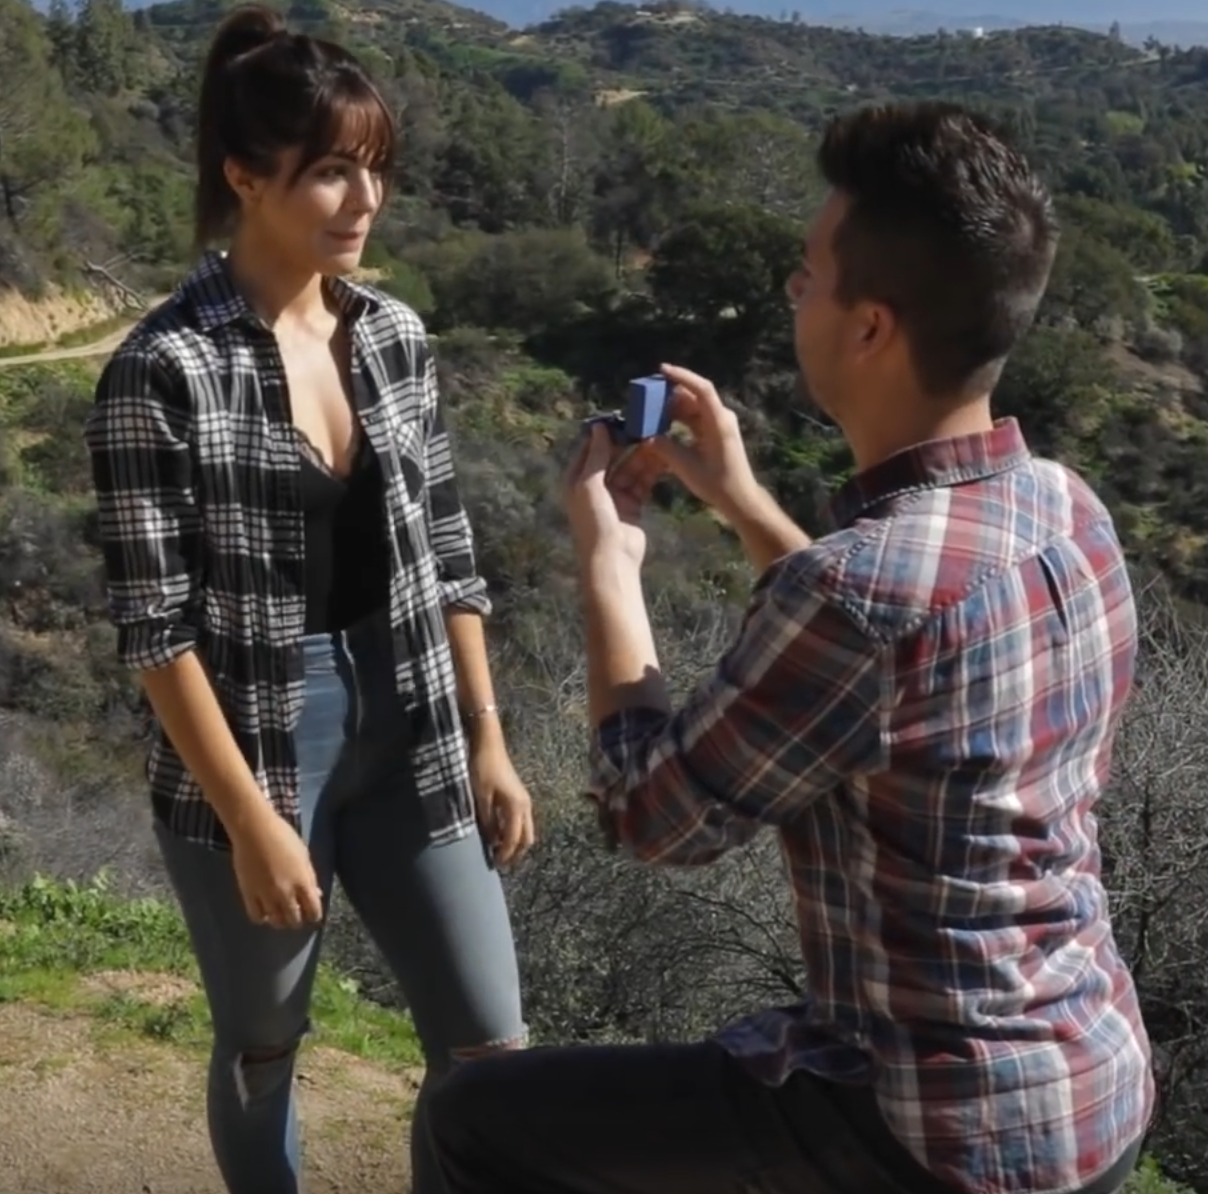 Millennial wedding proposal